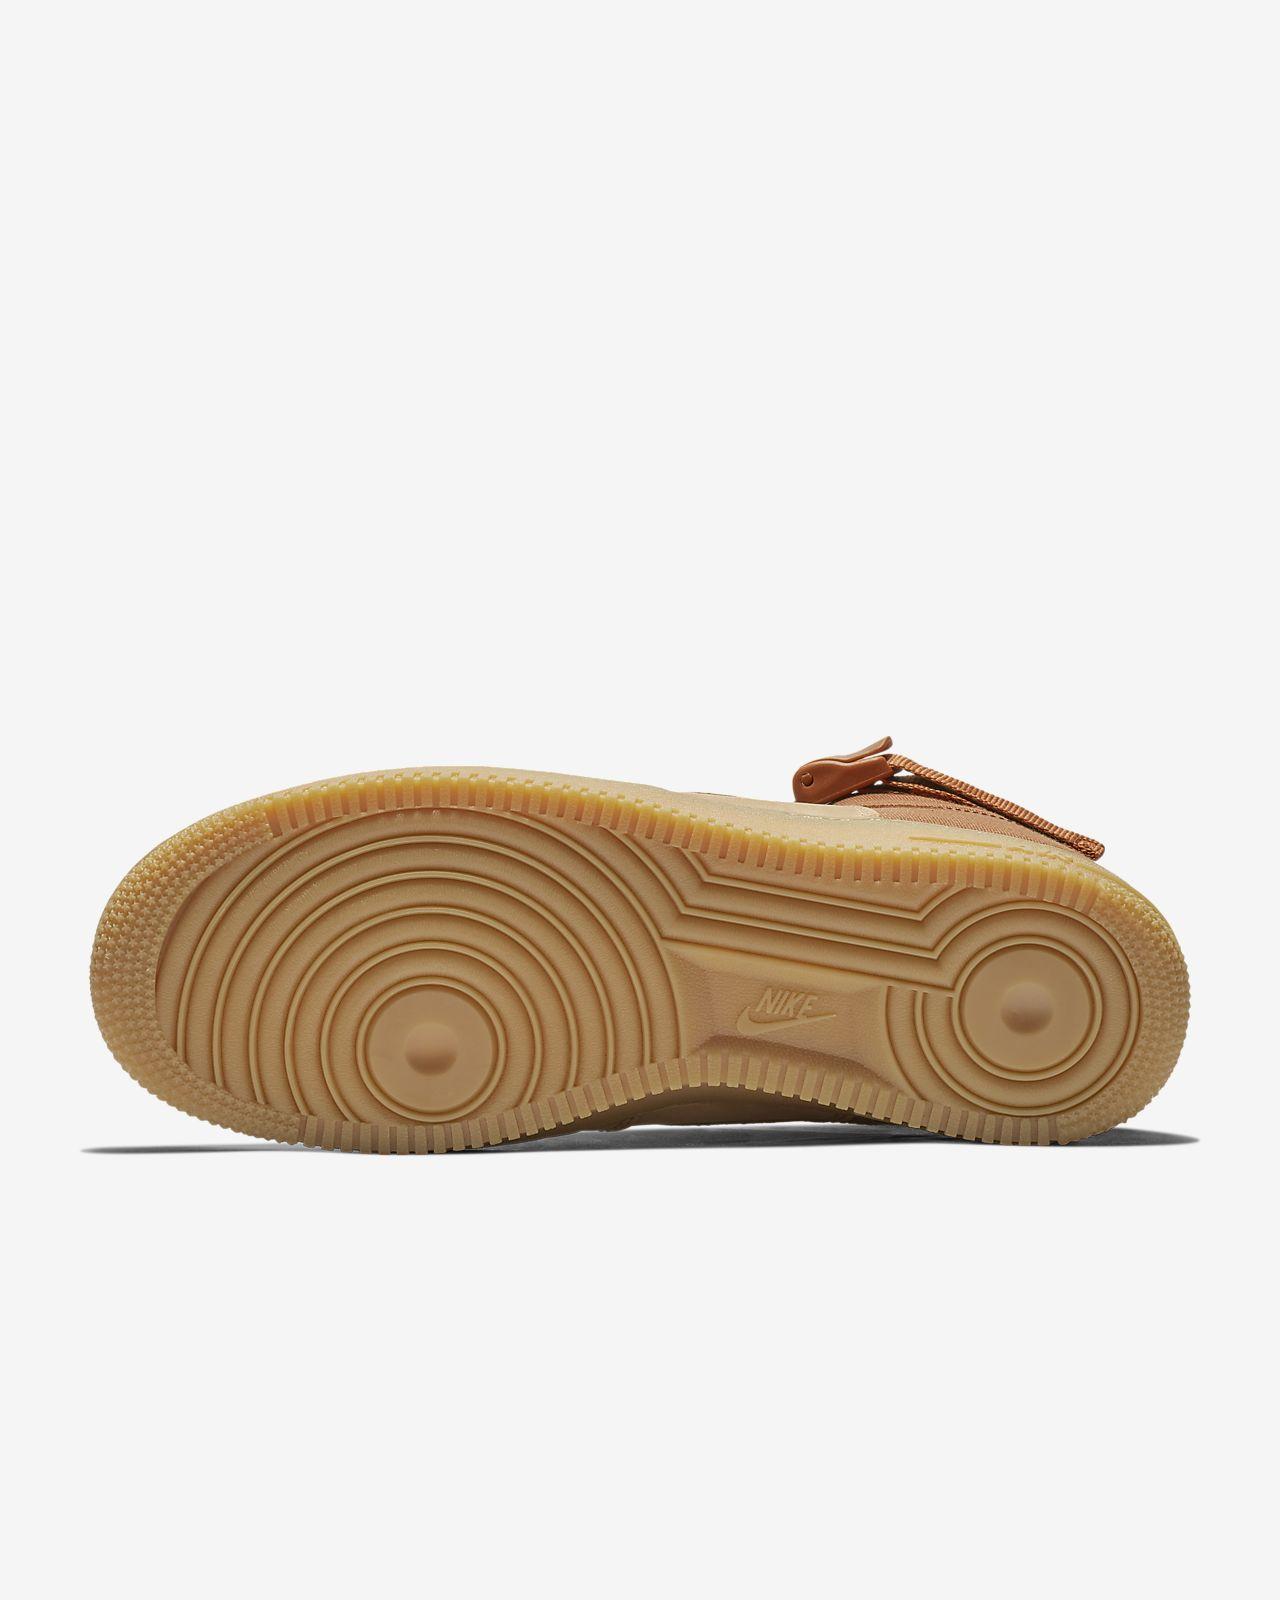 914f1b622c77 Nike SF Air Force 1 Mid Premium Men s Shoe. Nike.com CZ